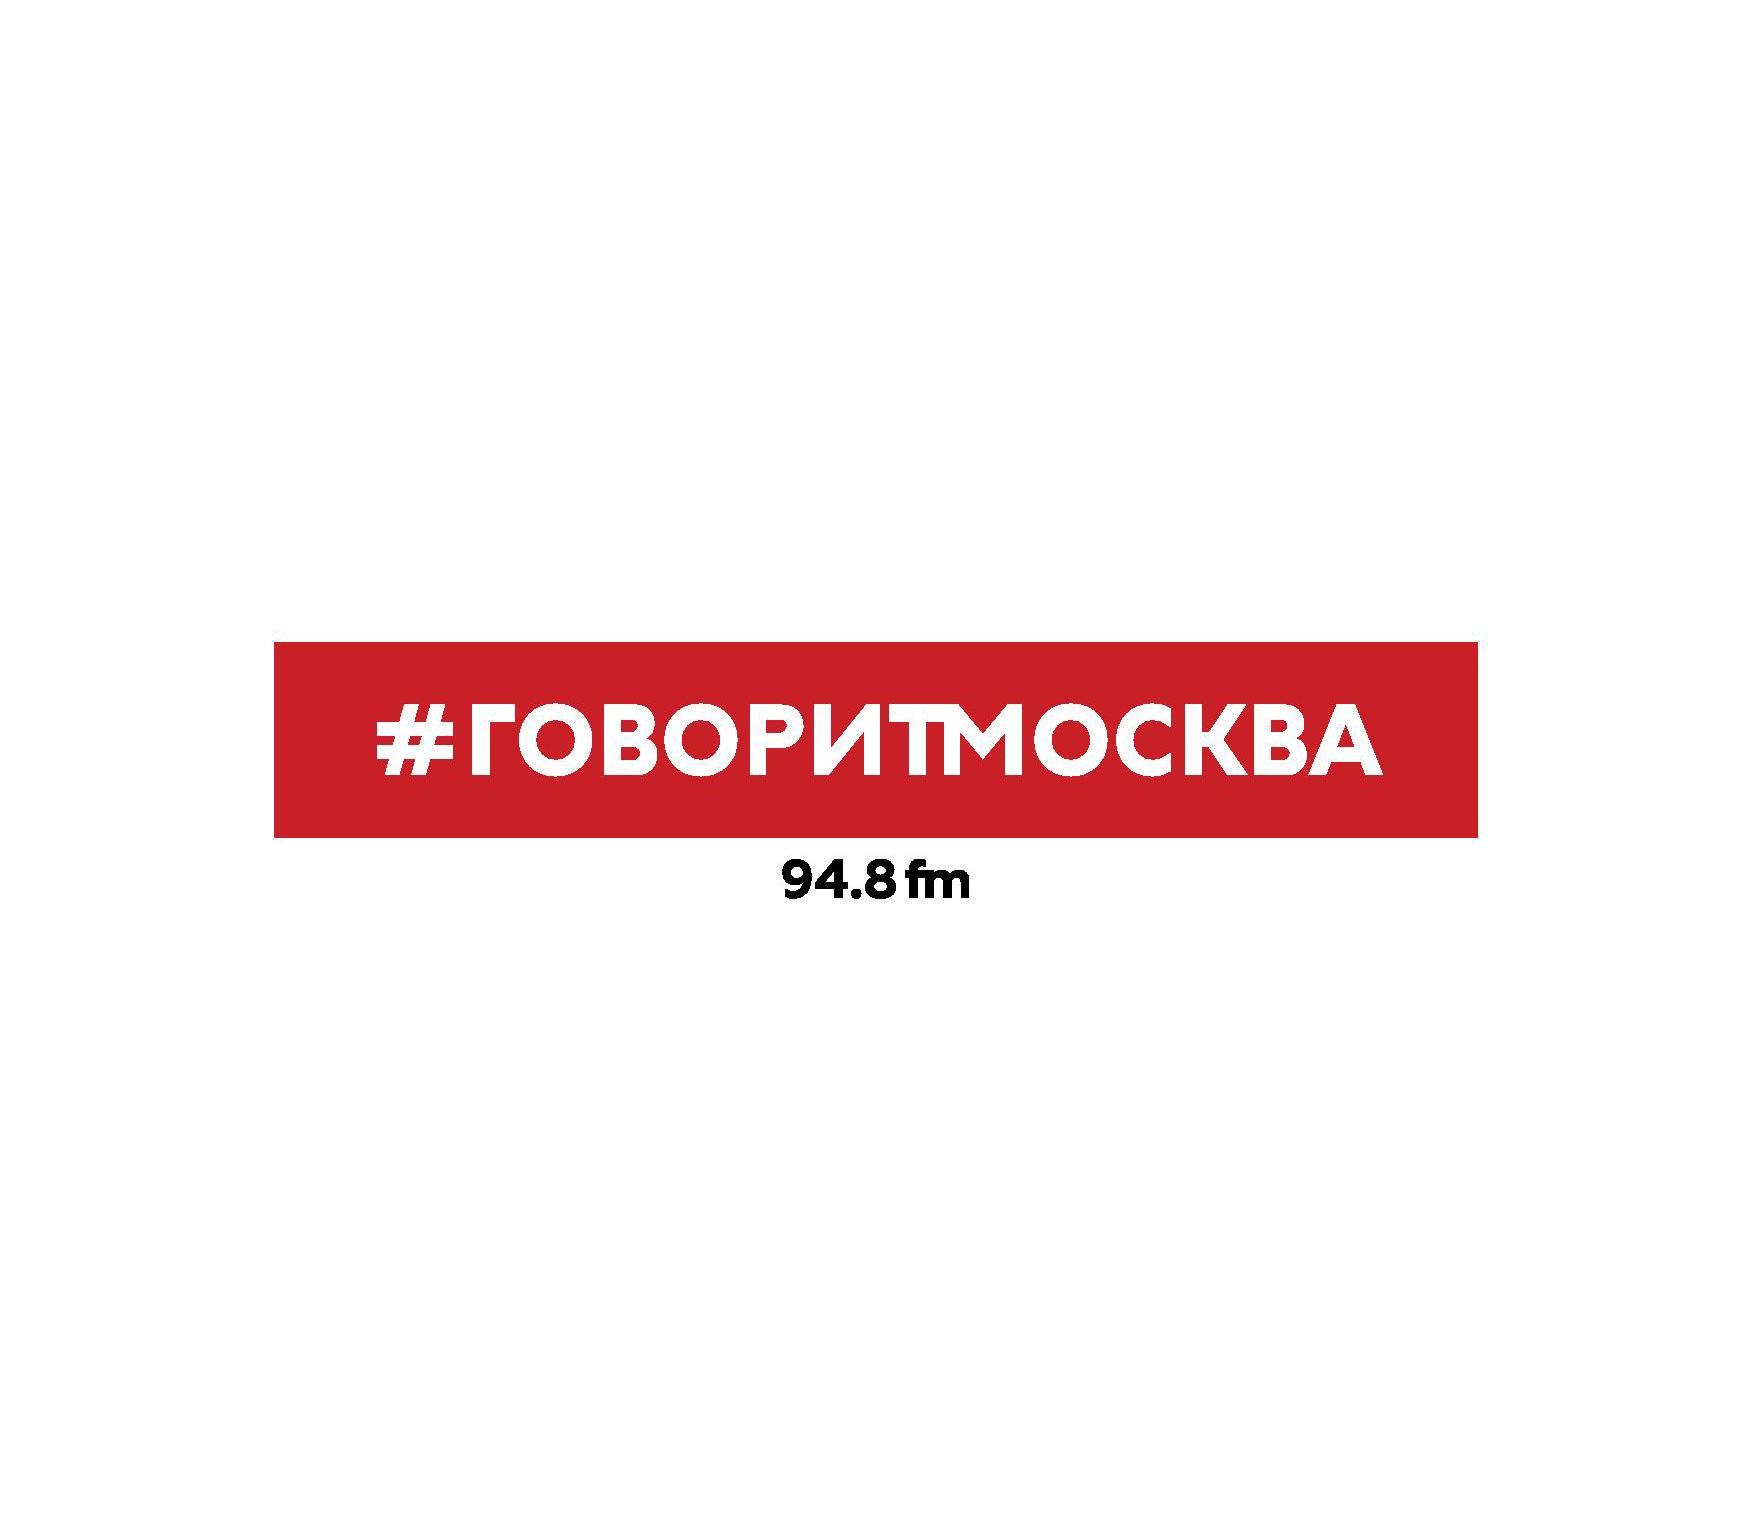 Михаил Родин Средневековая торговля михаил родин золотая орда